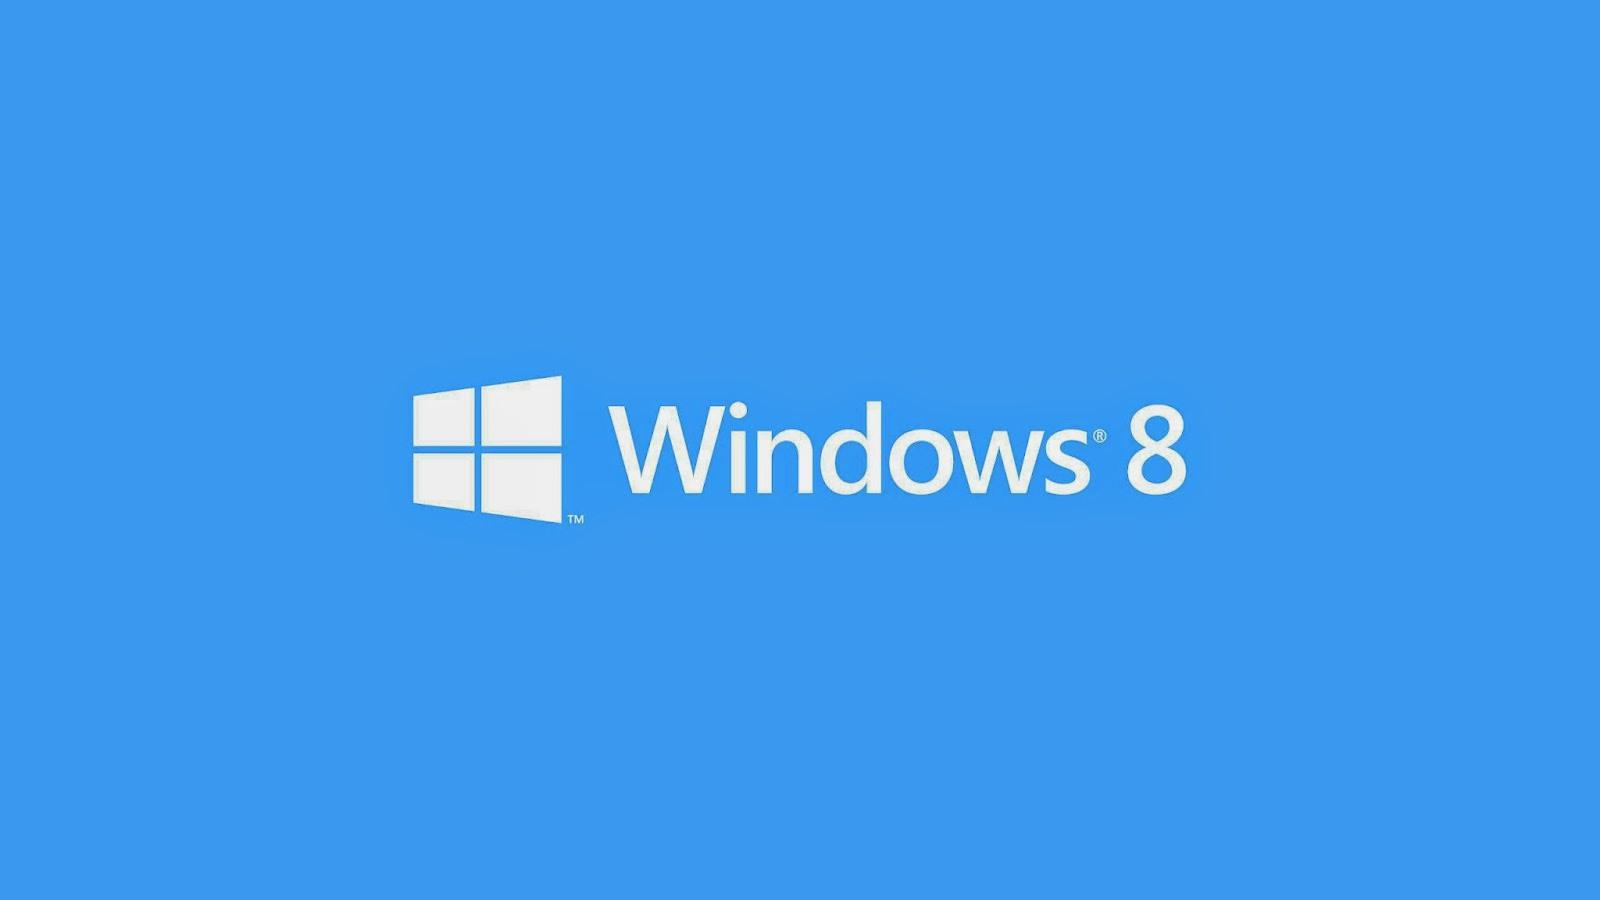 Sky-blue-background-white-text-theme-windows-8-wallpaper.jpg